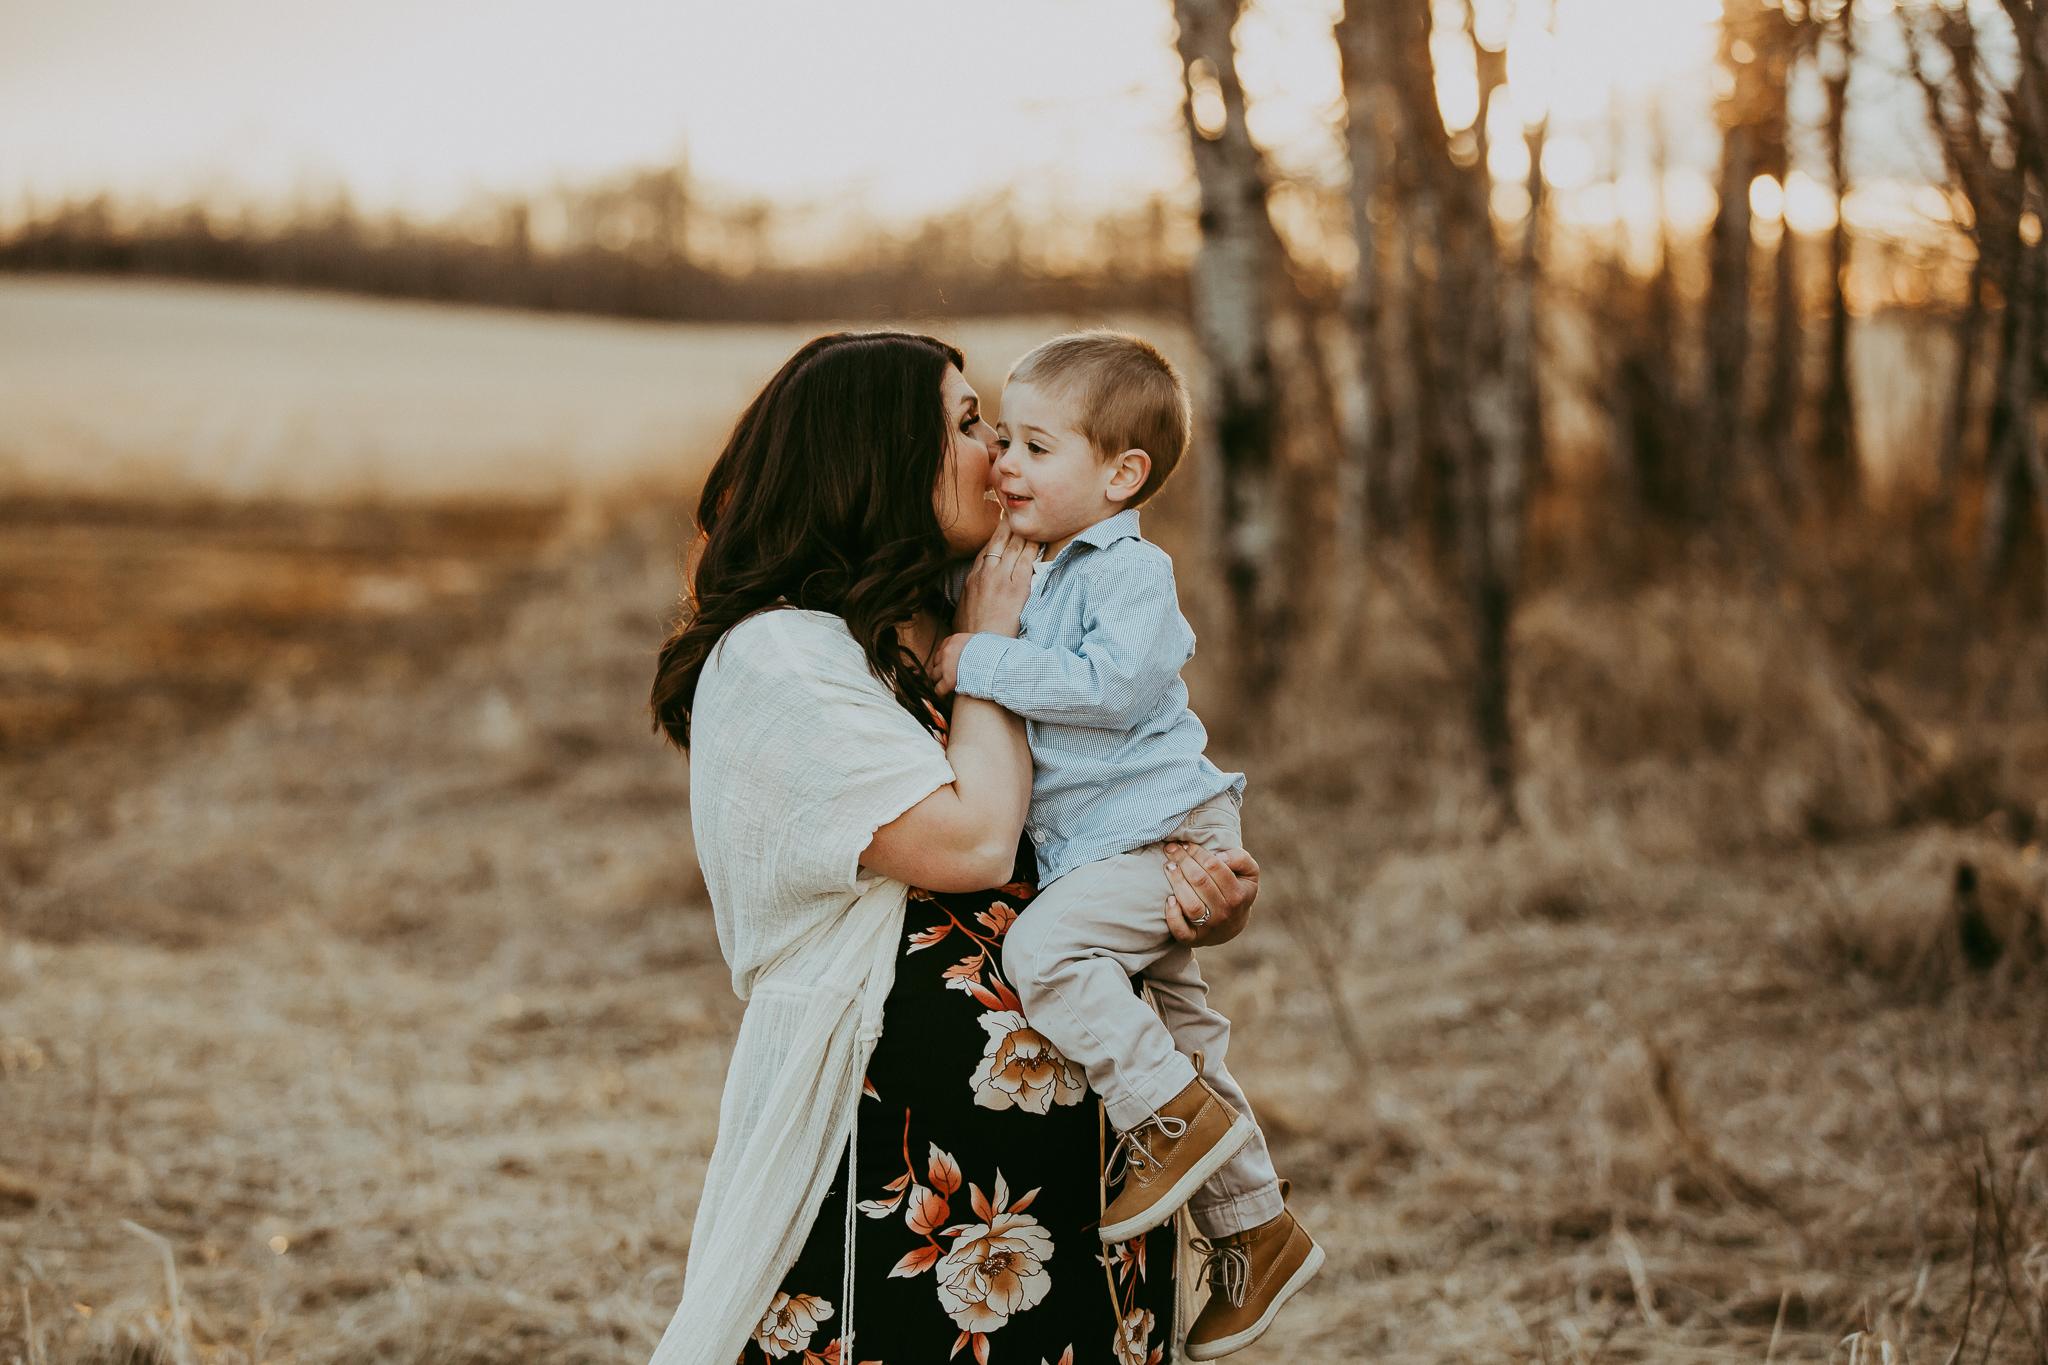 Alina-Joy-Photography-Cold-Lake-Maternity-Photographer-Josee-53.jpg